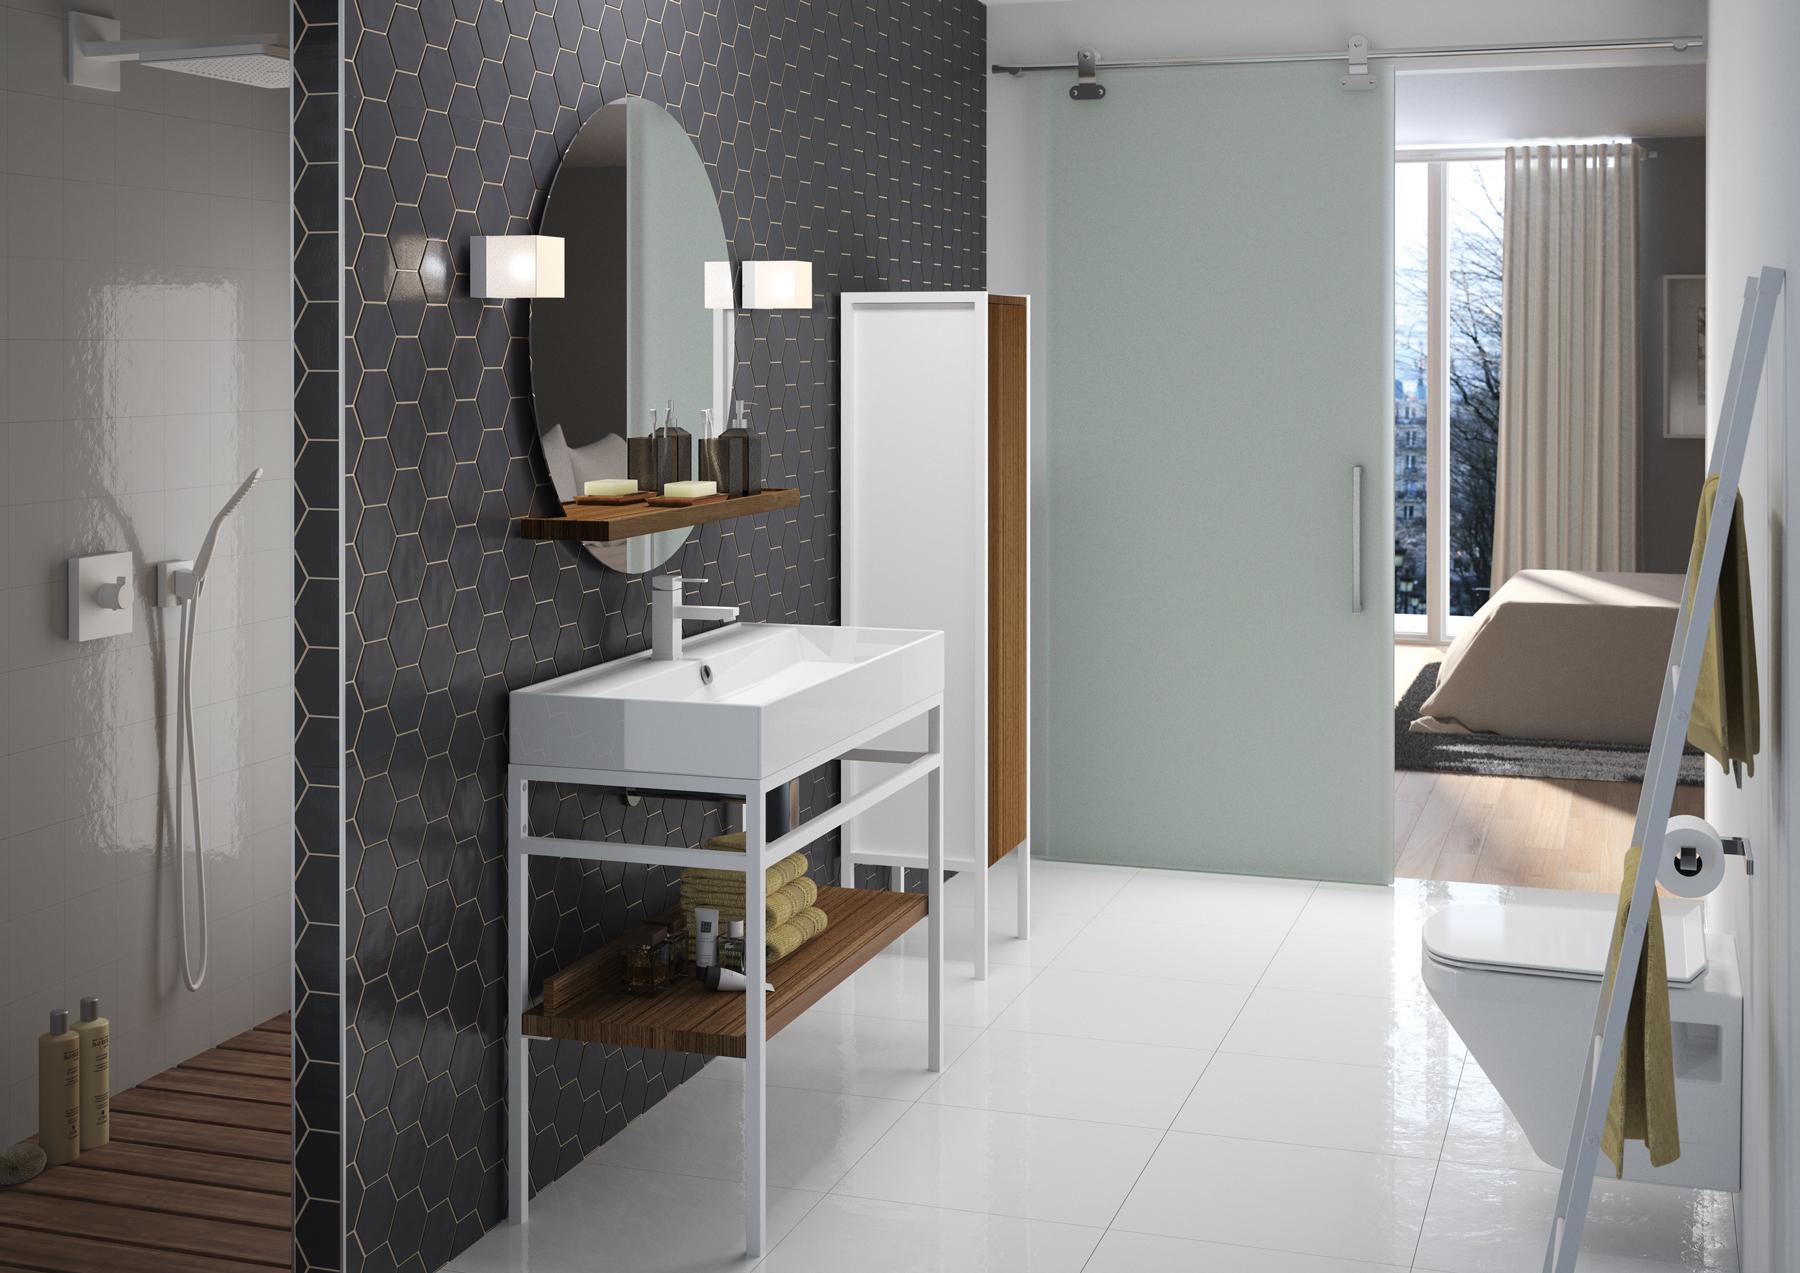 Steel meubles de salle de bains baignoires fabricant fran ais cedam - Fabricants de meubles francais ...